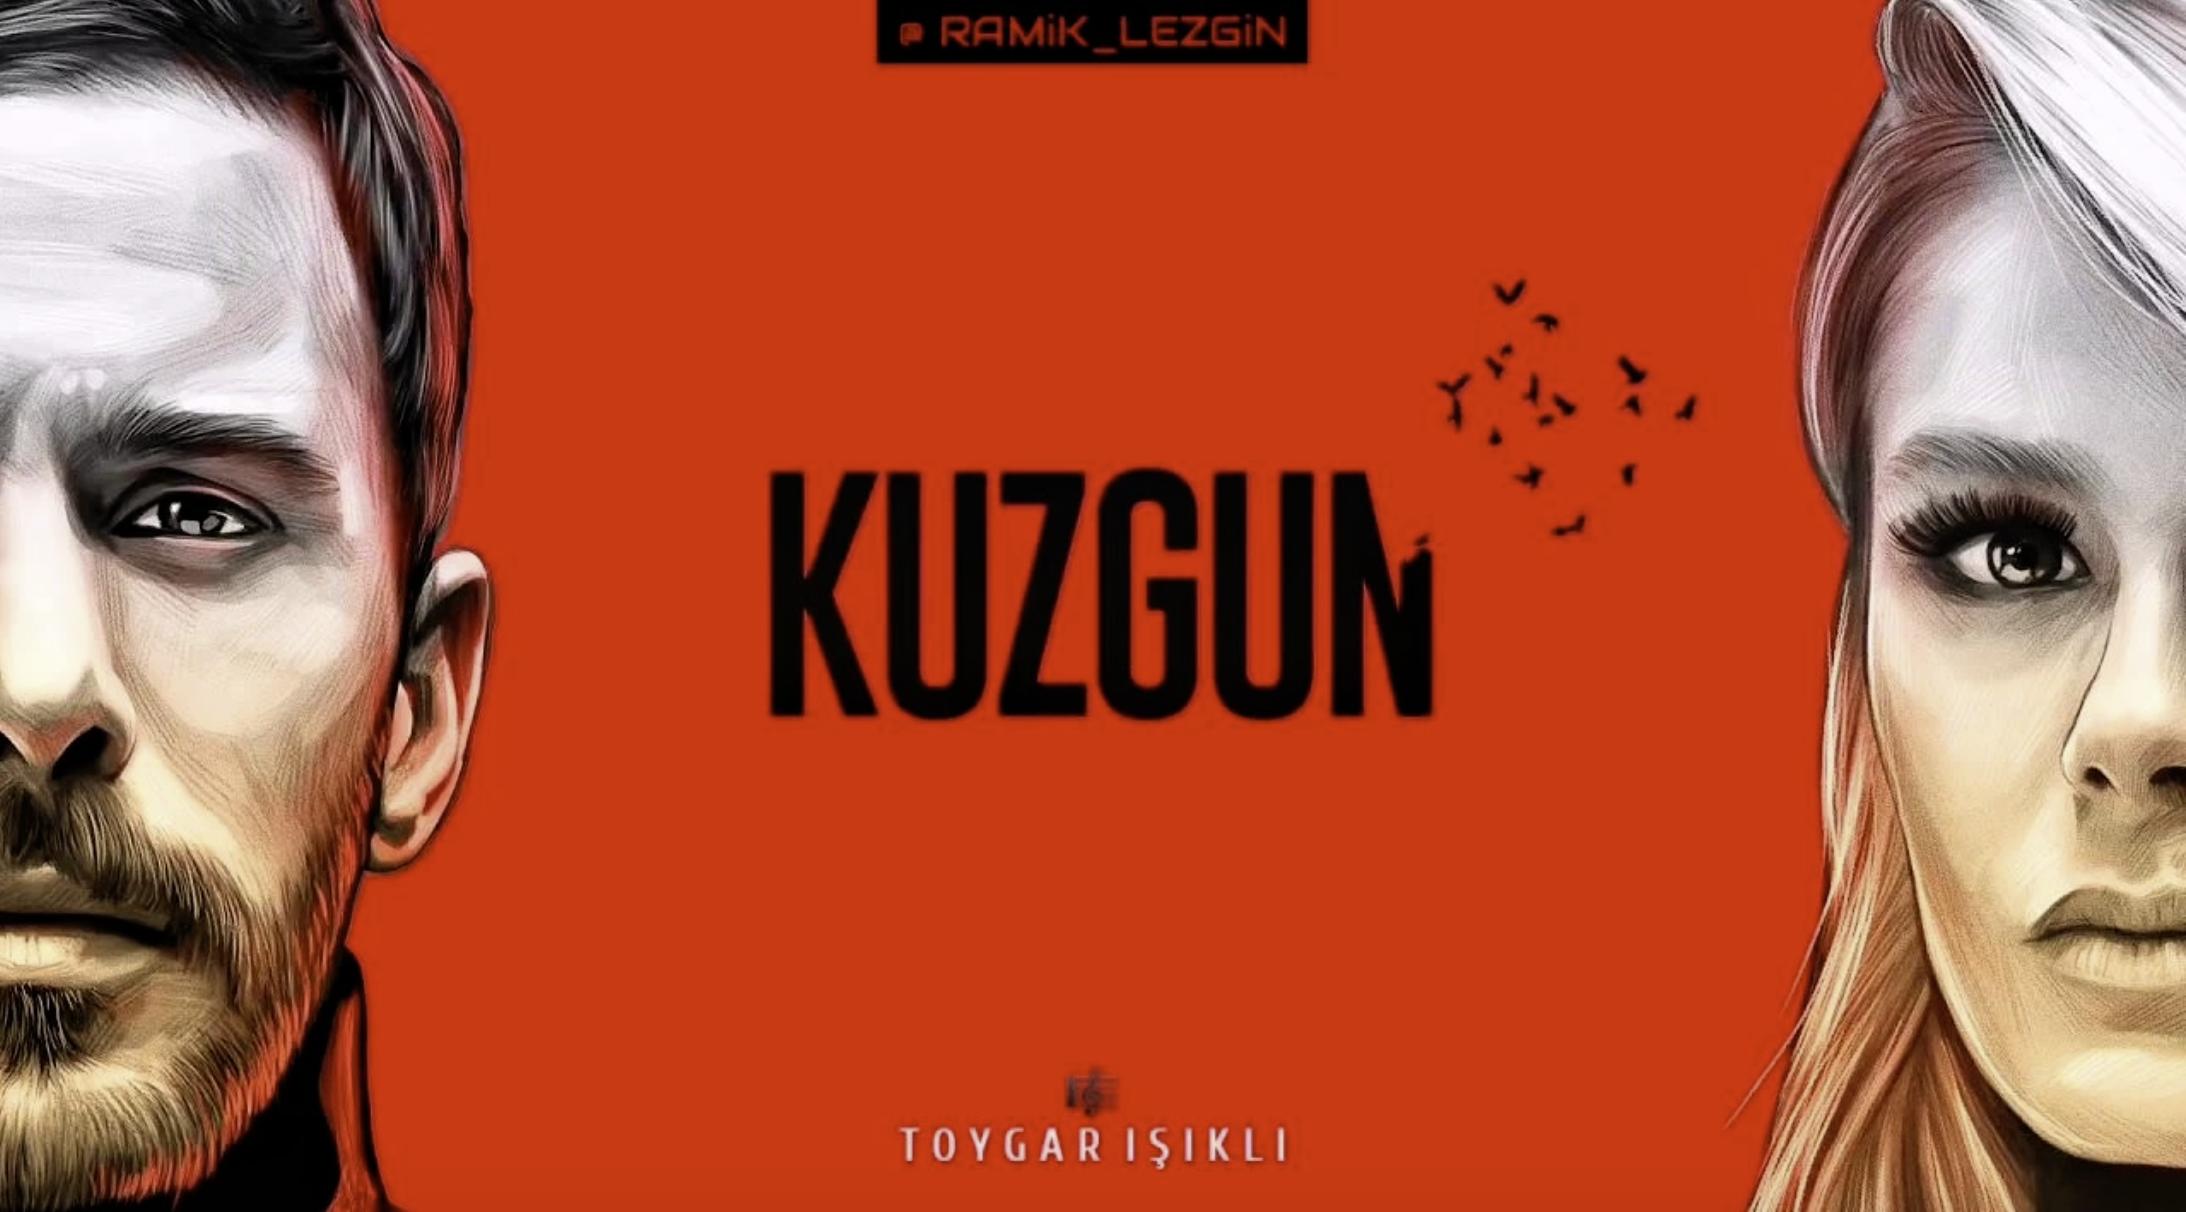 Kuzgun: The Hunter Becomes the Hunted